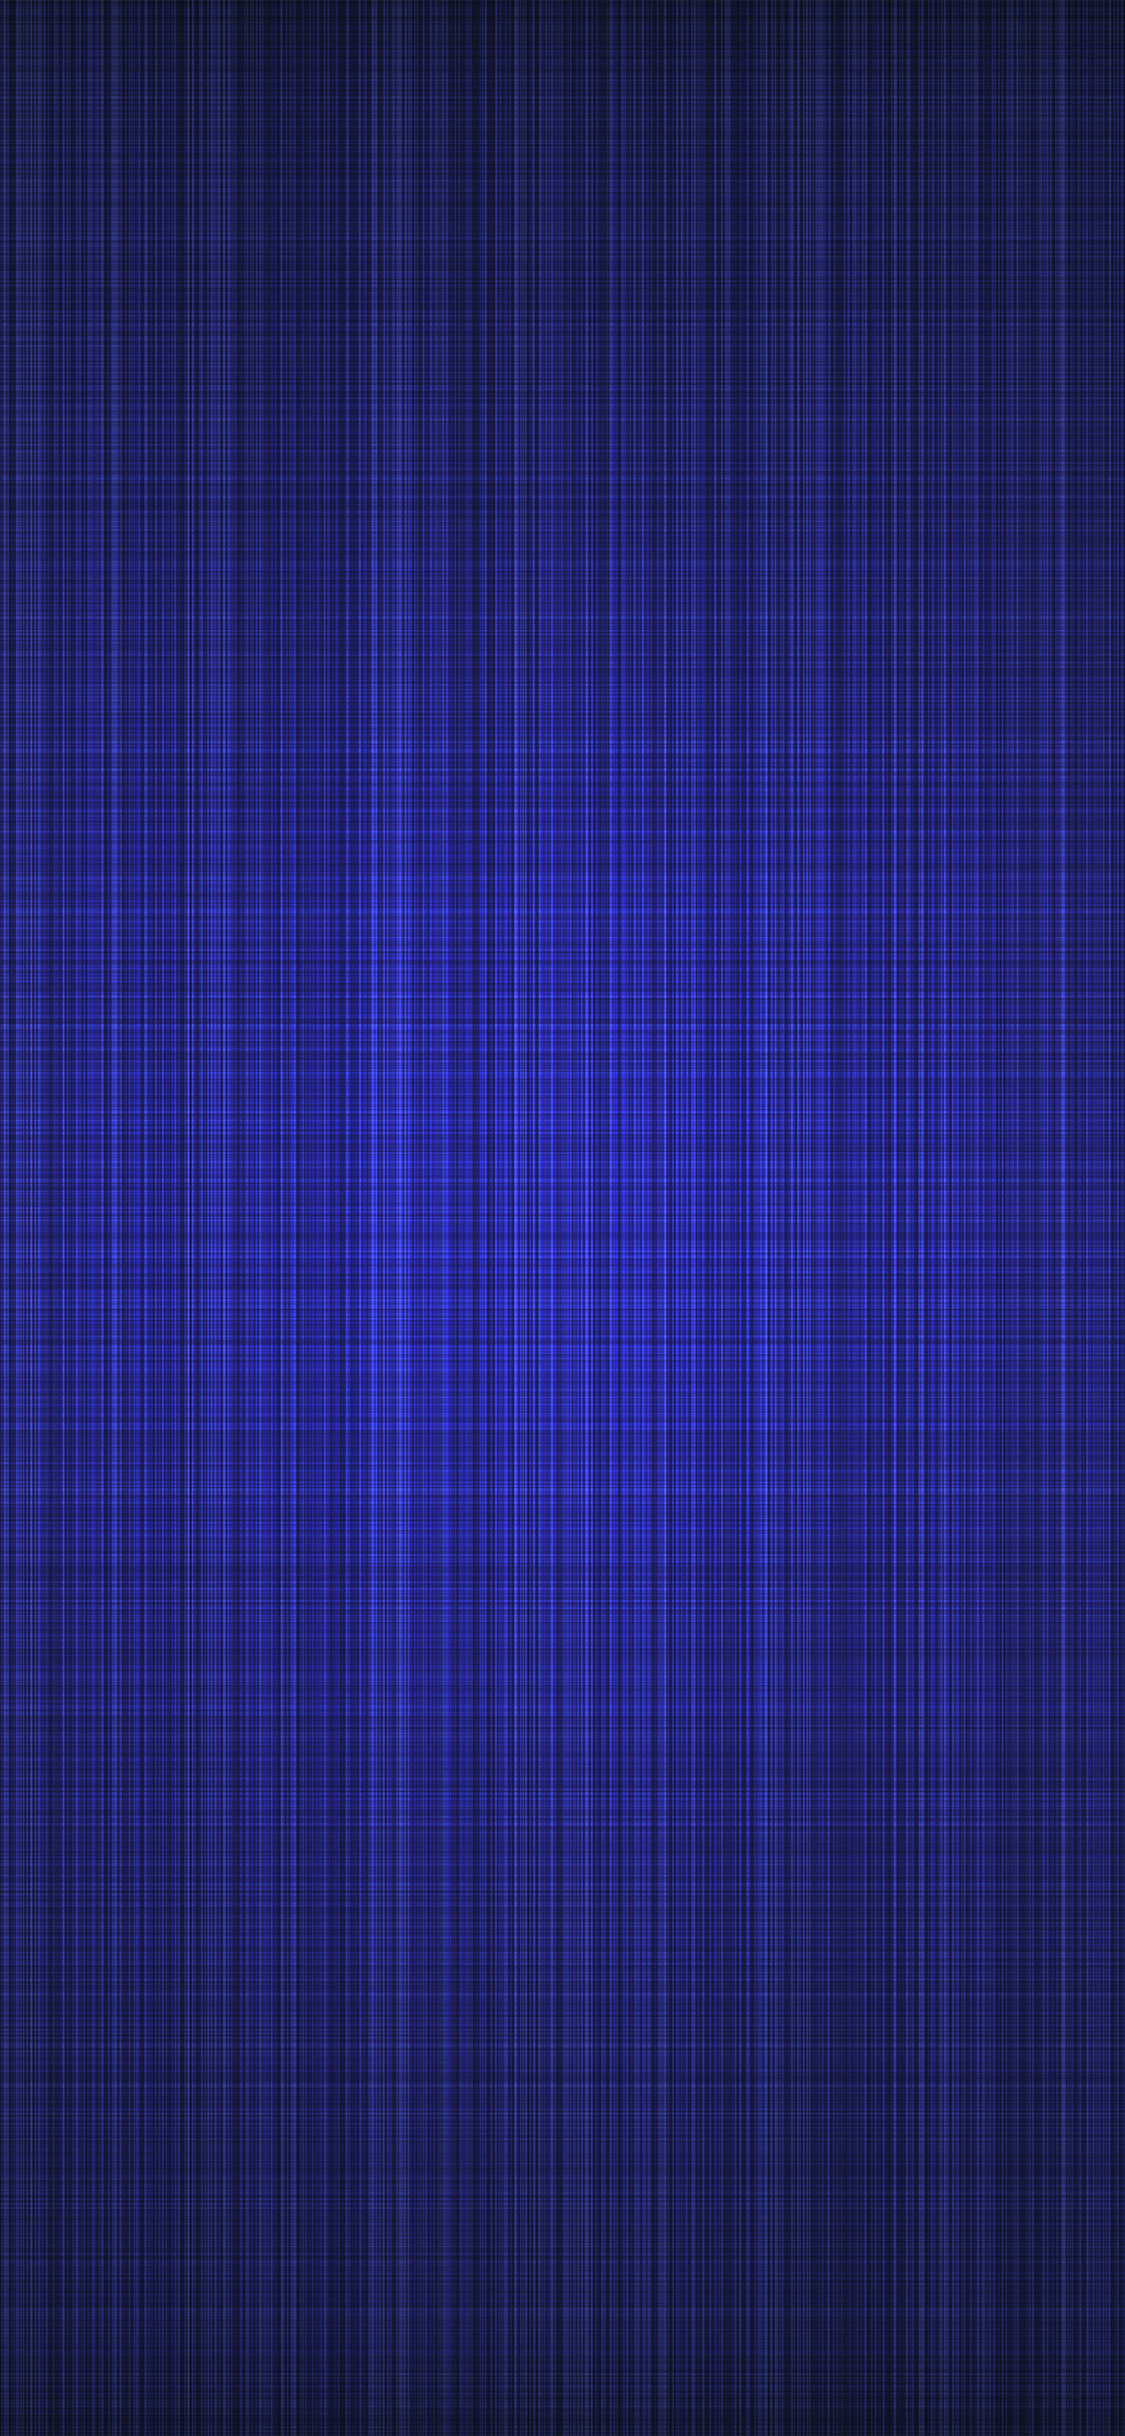 iPhoneXpapers.com-Apple-iPhone-wallpaper-vr80-linen-blue-dark-abstract-pattern